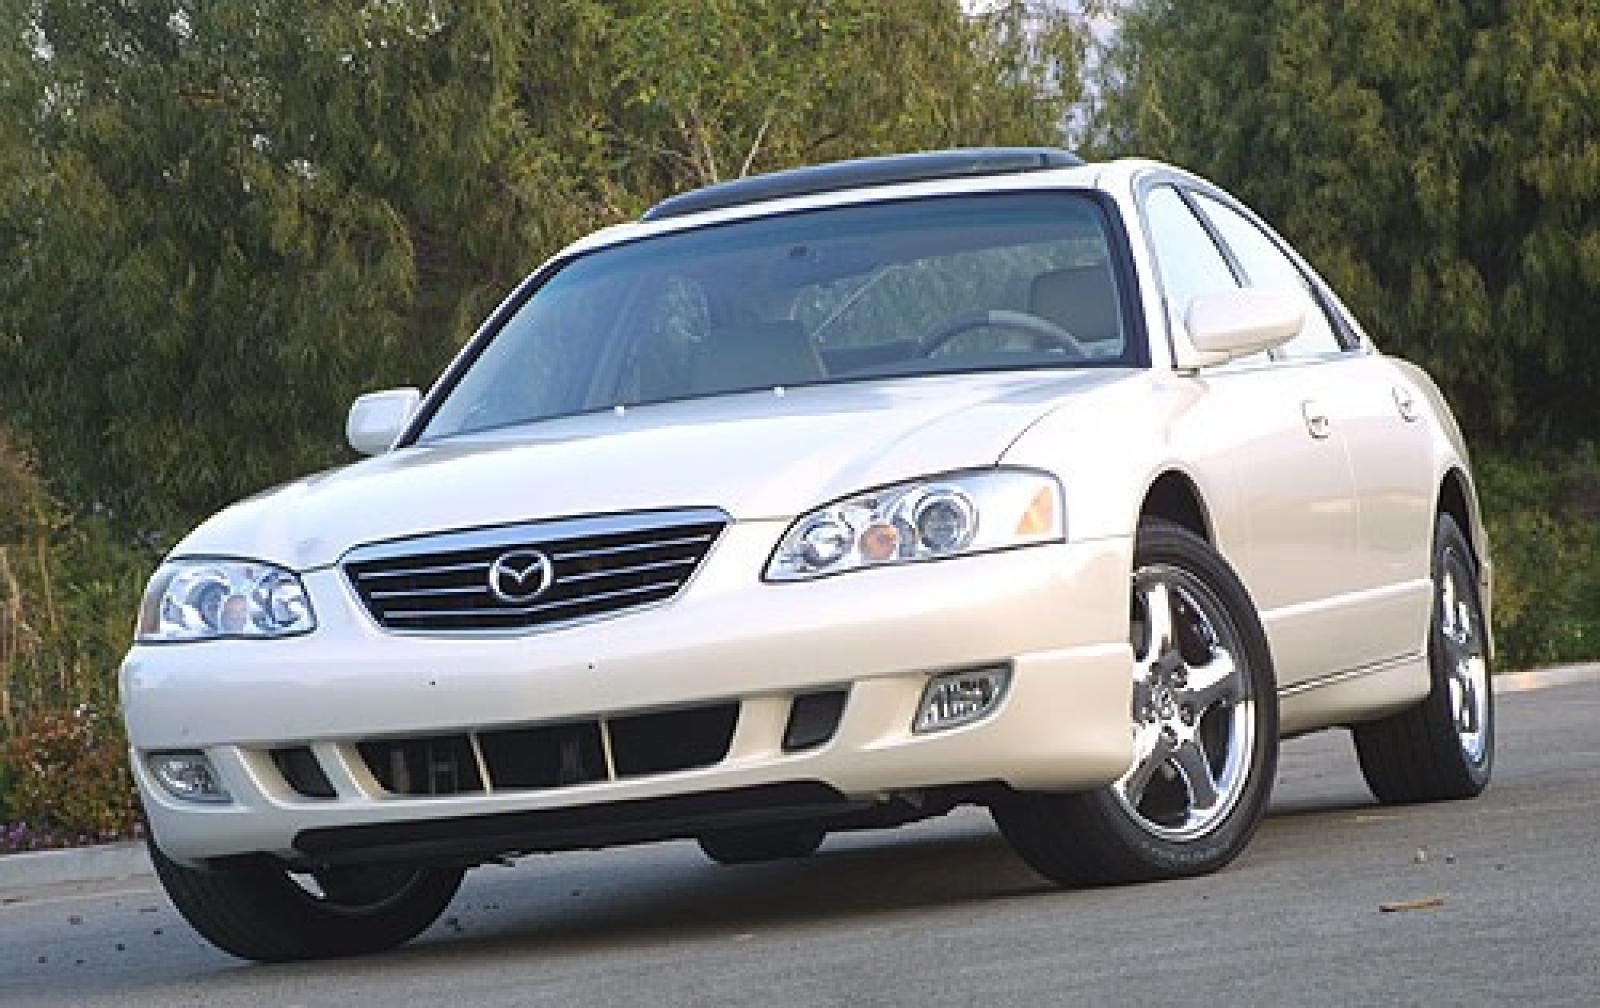 2002 mazda millenia information and photos zombiedrive rh zombdrive com 2002 Mazda Millenia Interior 2002 Mazda Millenia Interior